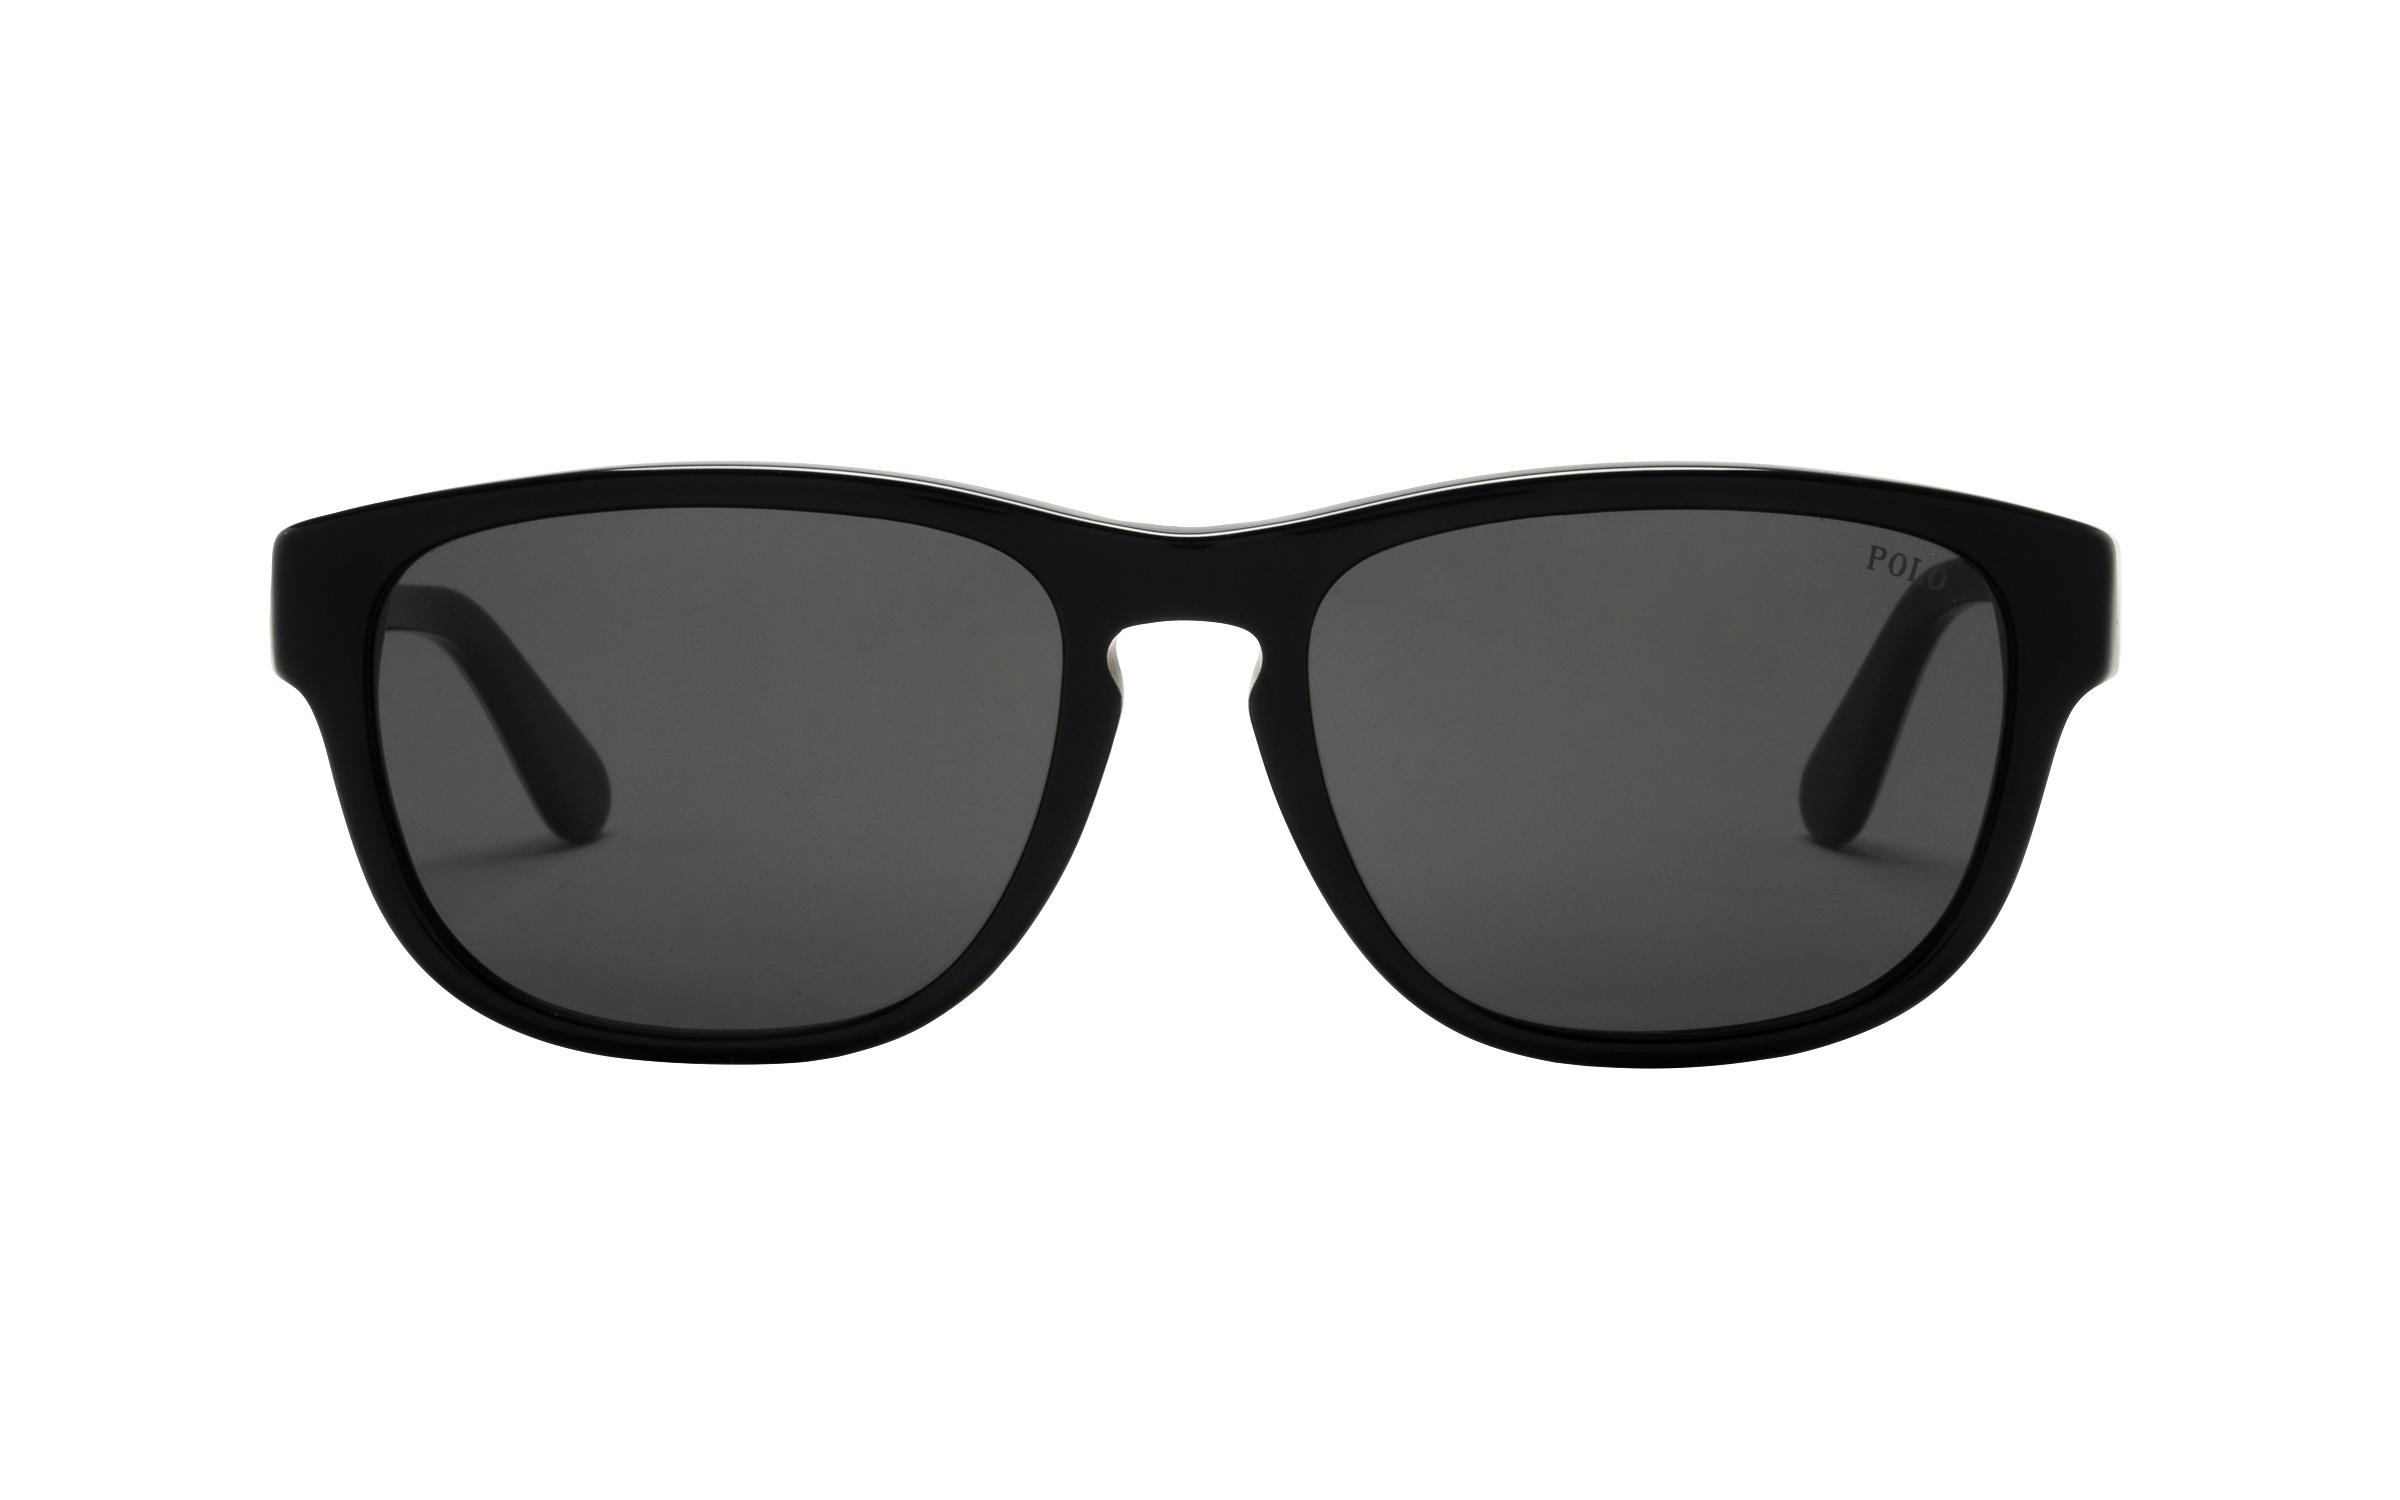 coastal.com - PoloRalphLauren Polo Ralph Lauren PH4158 500187 55 Sunglasses in Black – Online Coastal 158.00 USD